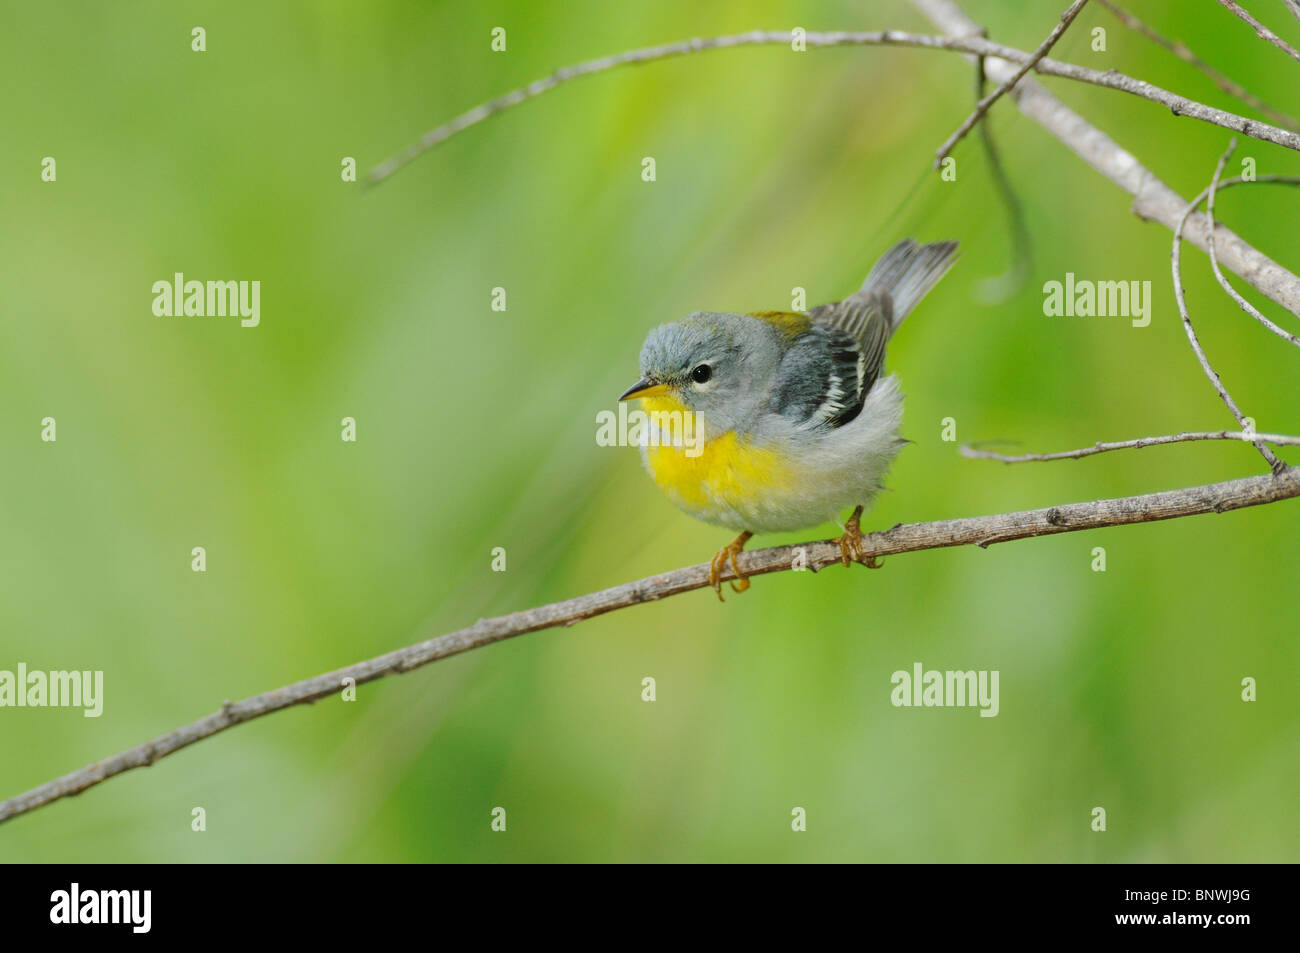 Northern Parula (Parula americana),male, Port Aransas, Mustang Island, Coastal Bend, Texas Coast, USA - Stock Image